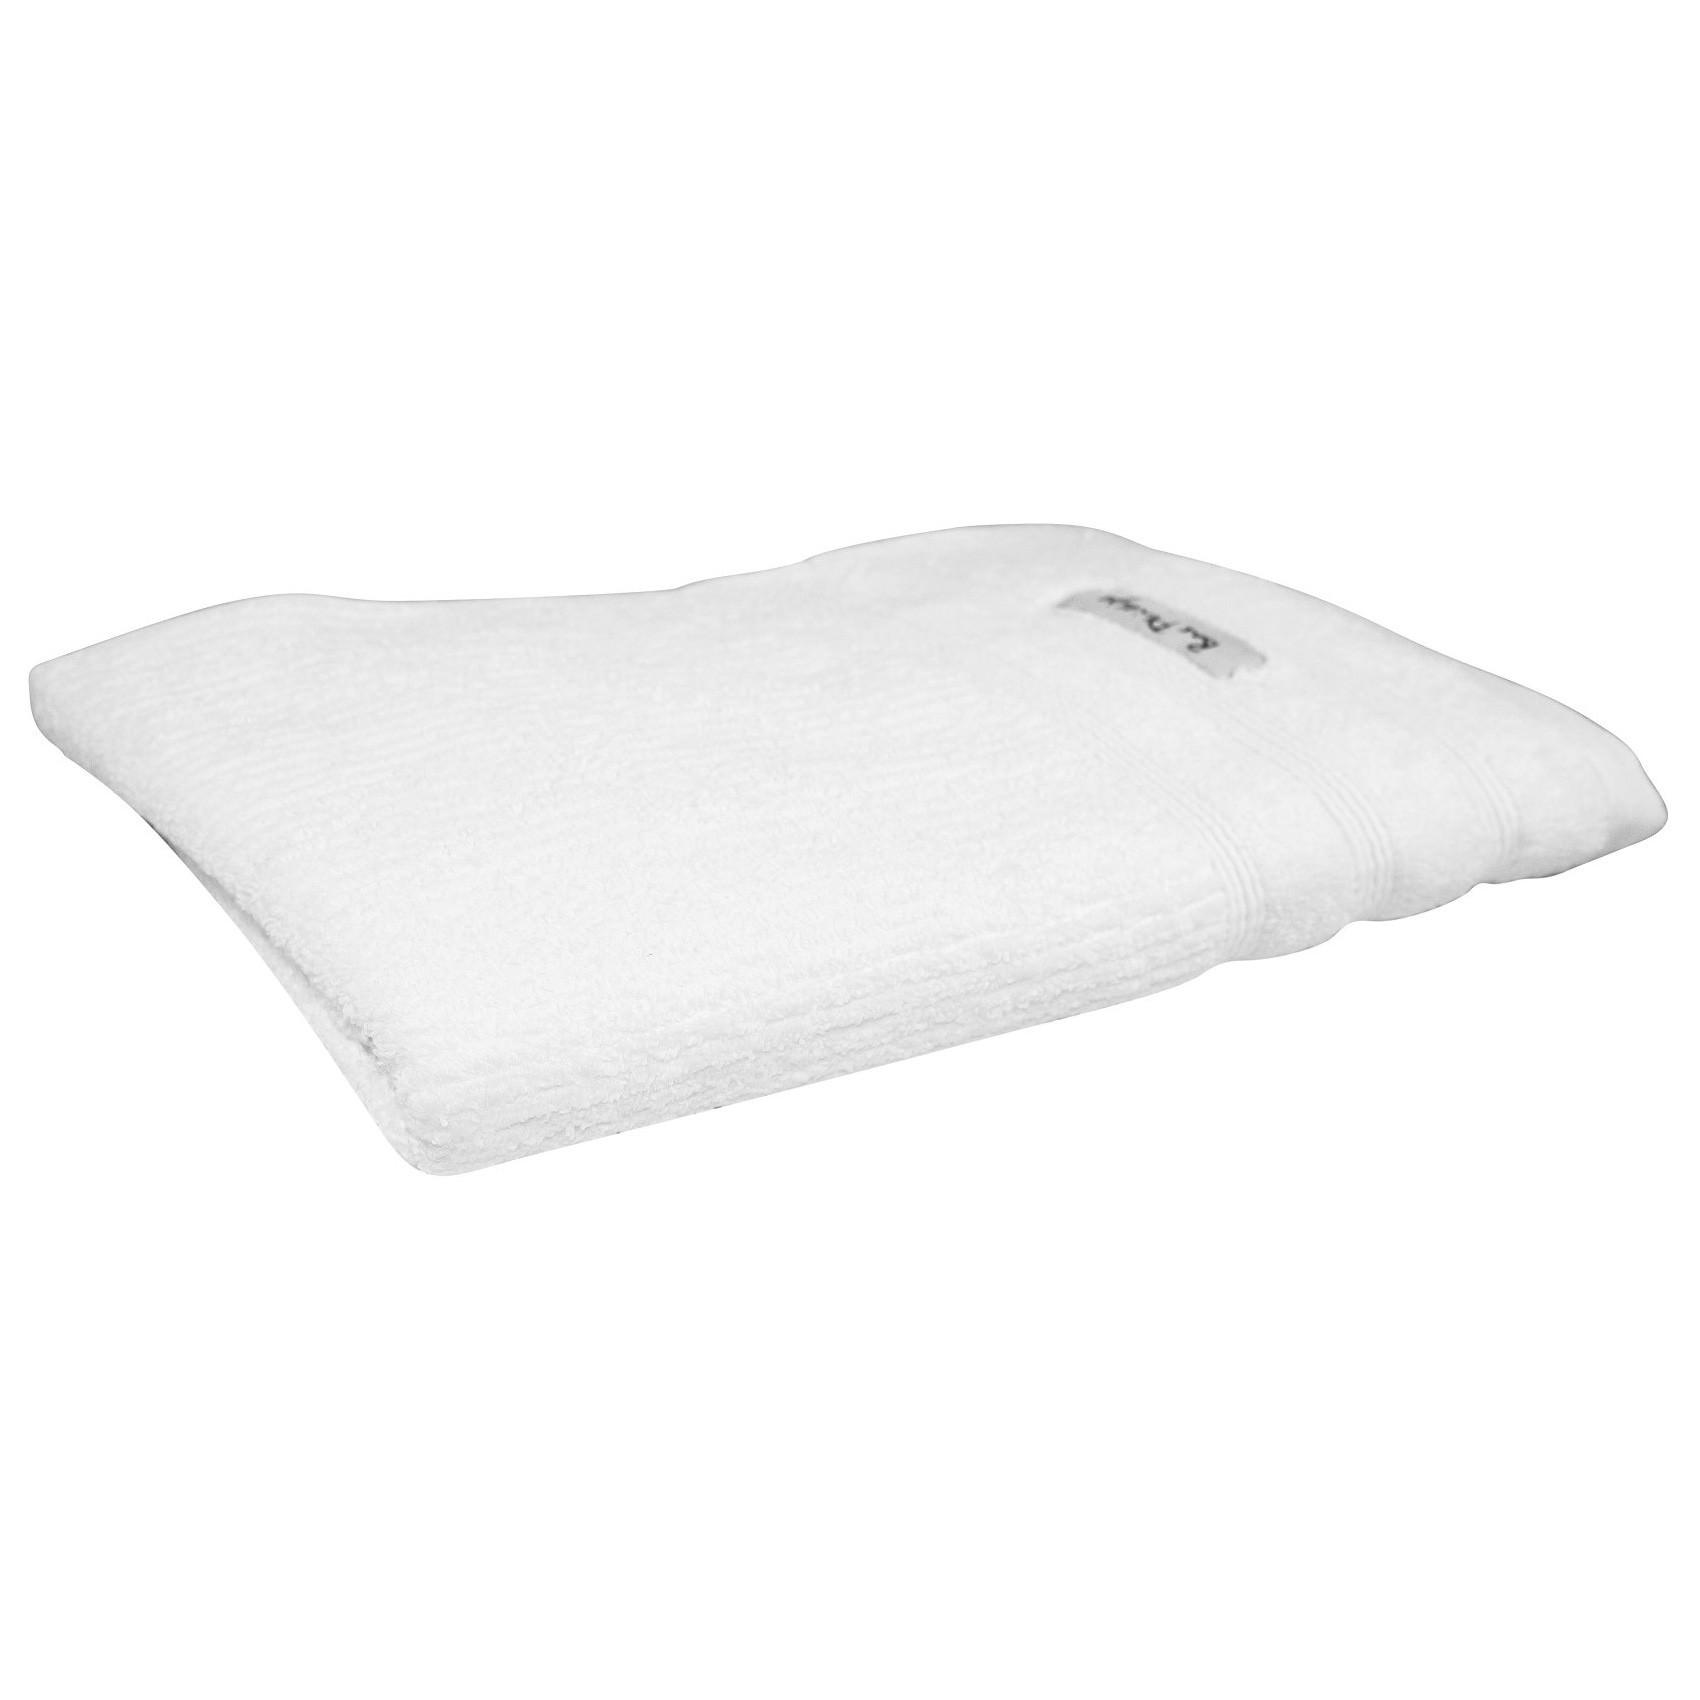 Bas Phillips Cairo Egyptian Cotton Bath Sheet, White